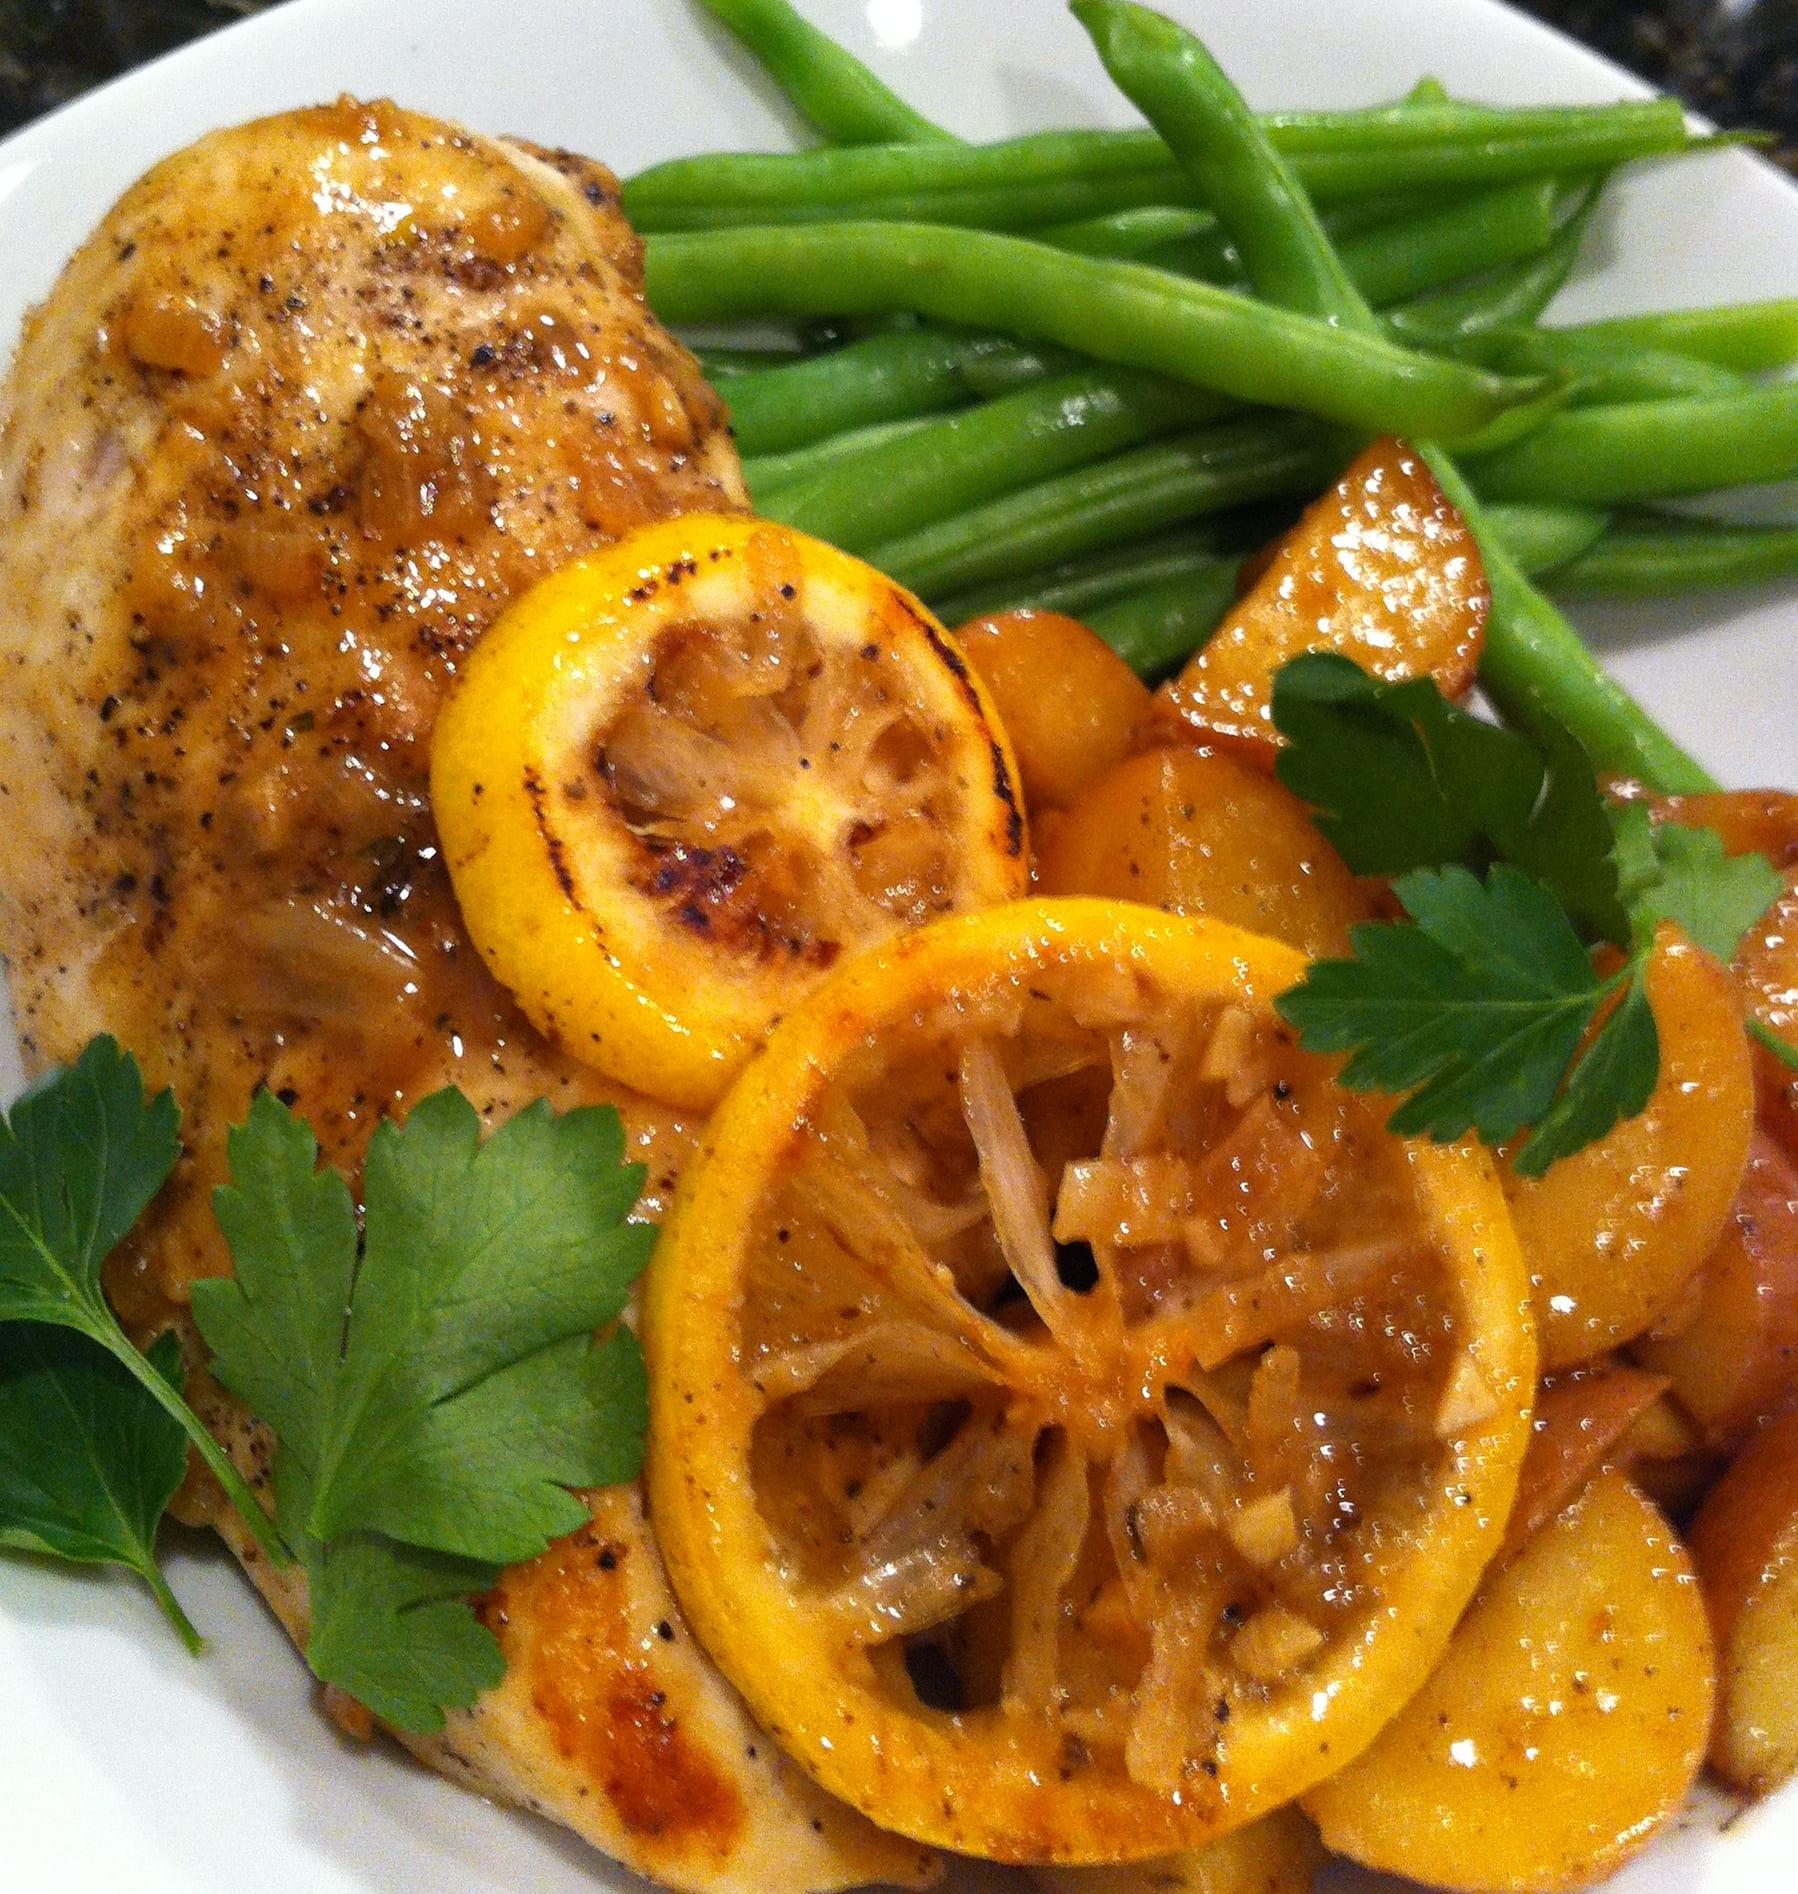 Meyer Lemon Chicken Plated